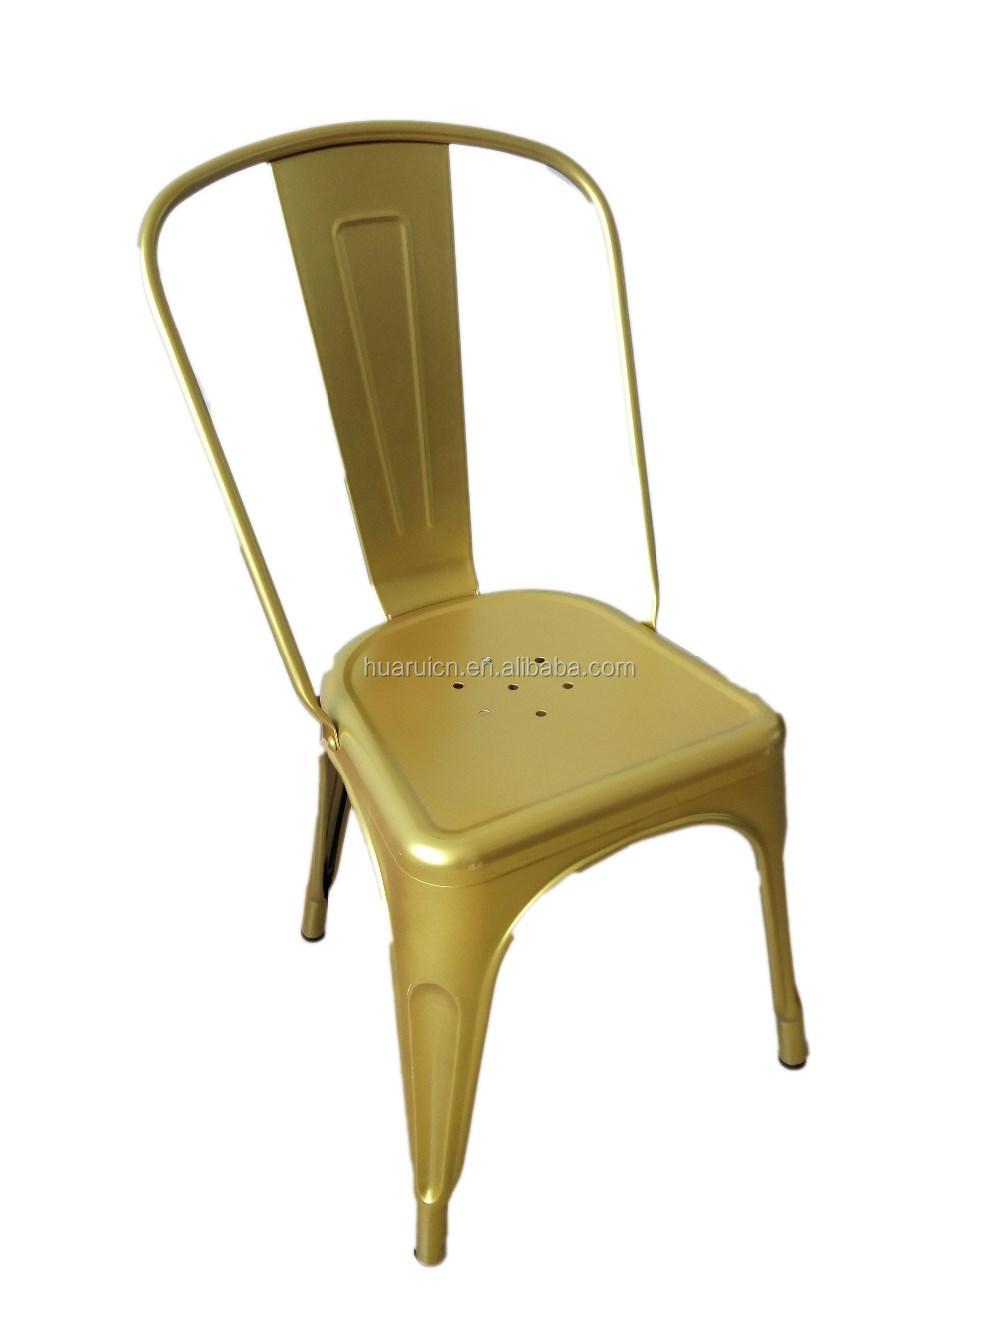 vintage sedia metallo francese all\'ingrosso-Acquista online i ...